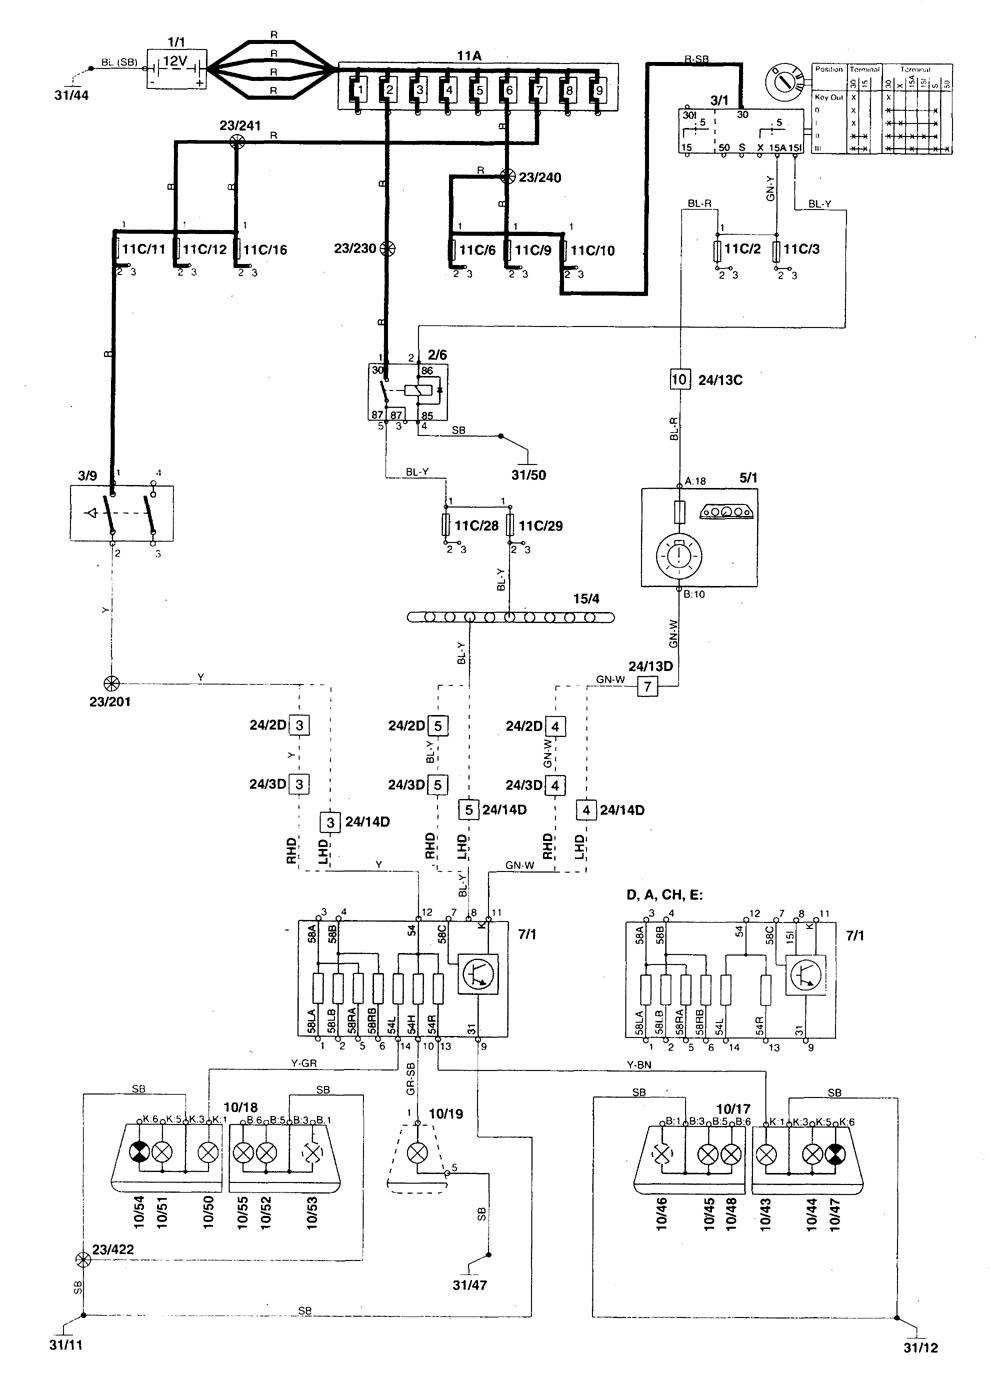 hight resolution of 2000 volvo s70 wiring diagram trusted wiring diagram volvo s40 fuse box 1999 volvo s80 fuse